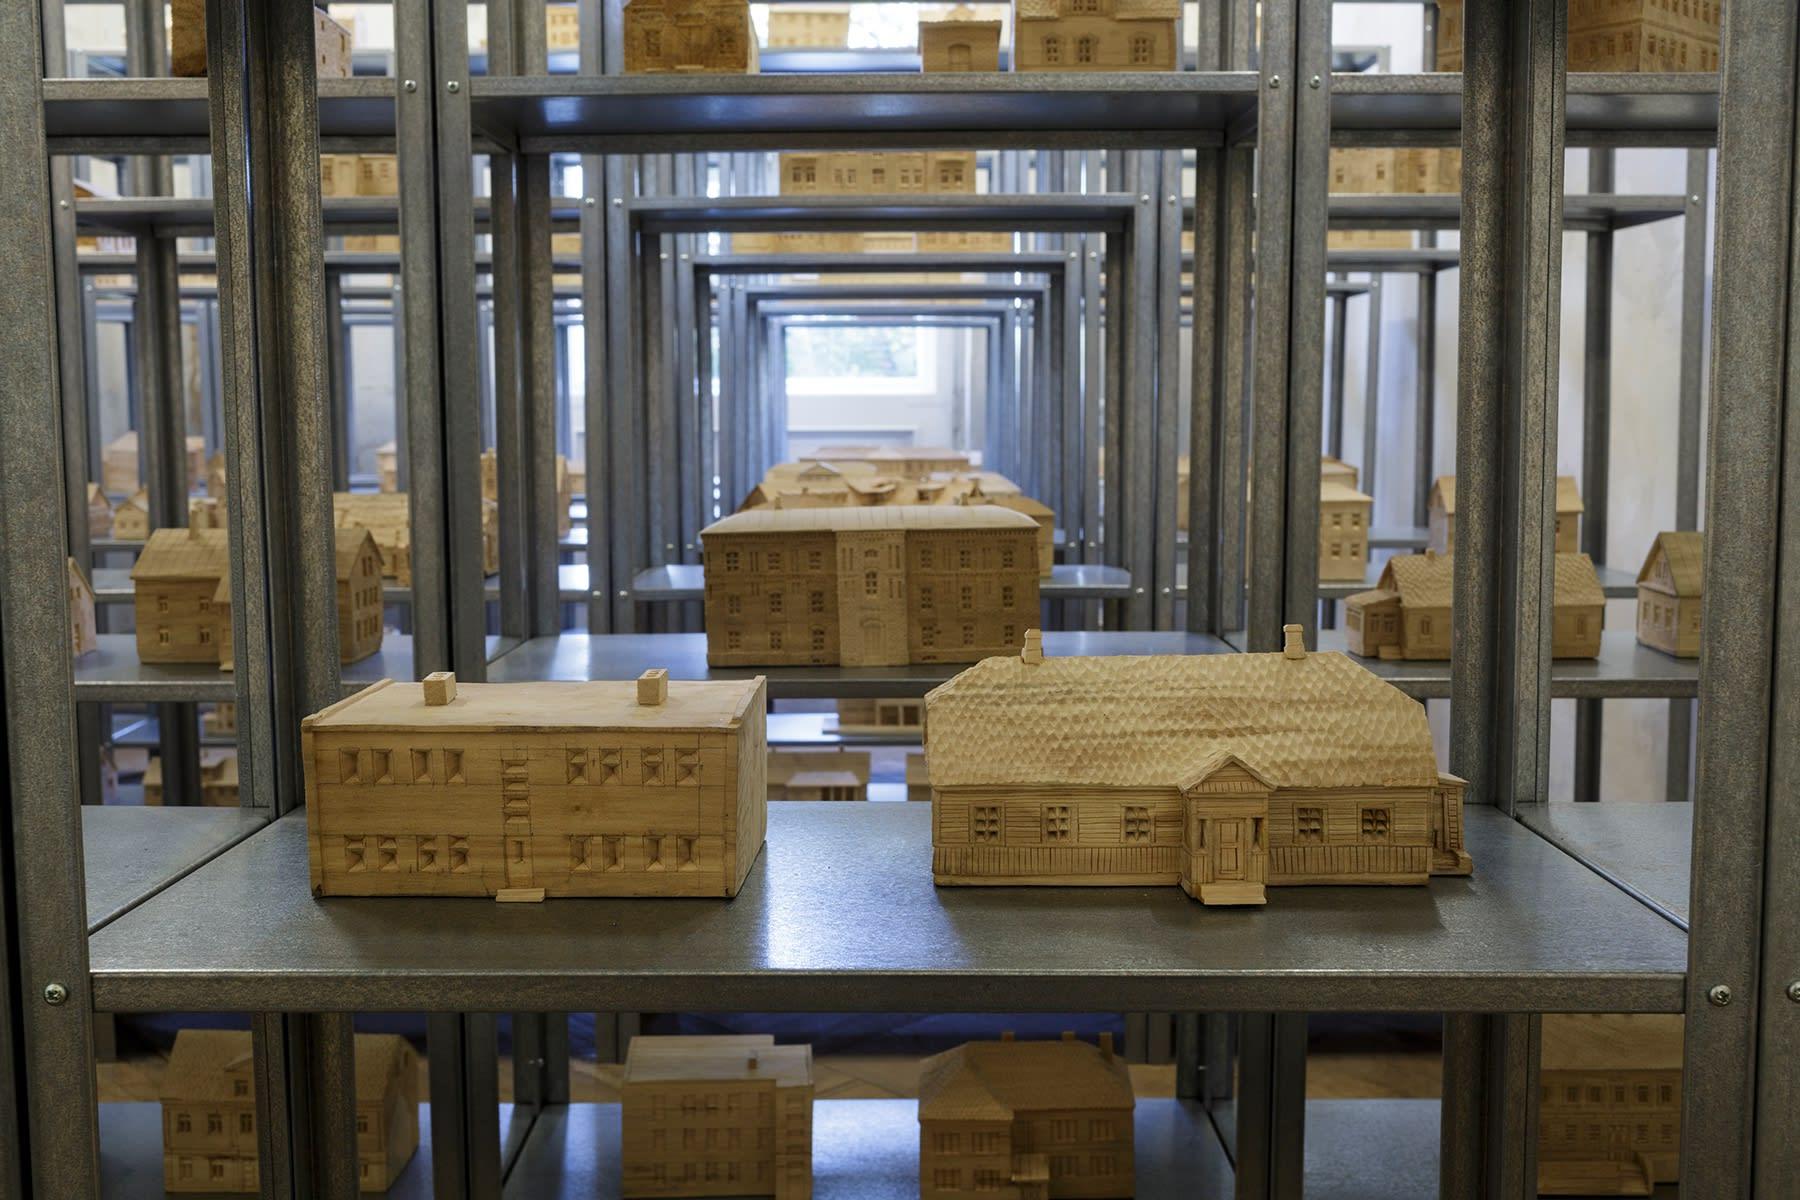 RIBOCA, 2018 Installation shot from exhibition Riga International Biennial Of Contemporary Art (RIBOCA) in Latvia on 2018. Curated by Katherina Gregos. Installation photography by Andrejs Strokins and Vladimir Svetlov.